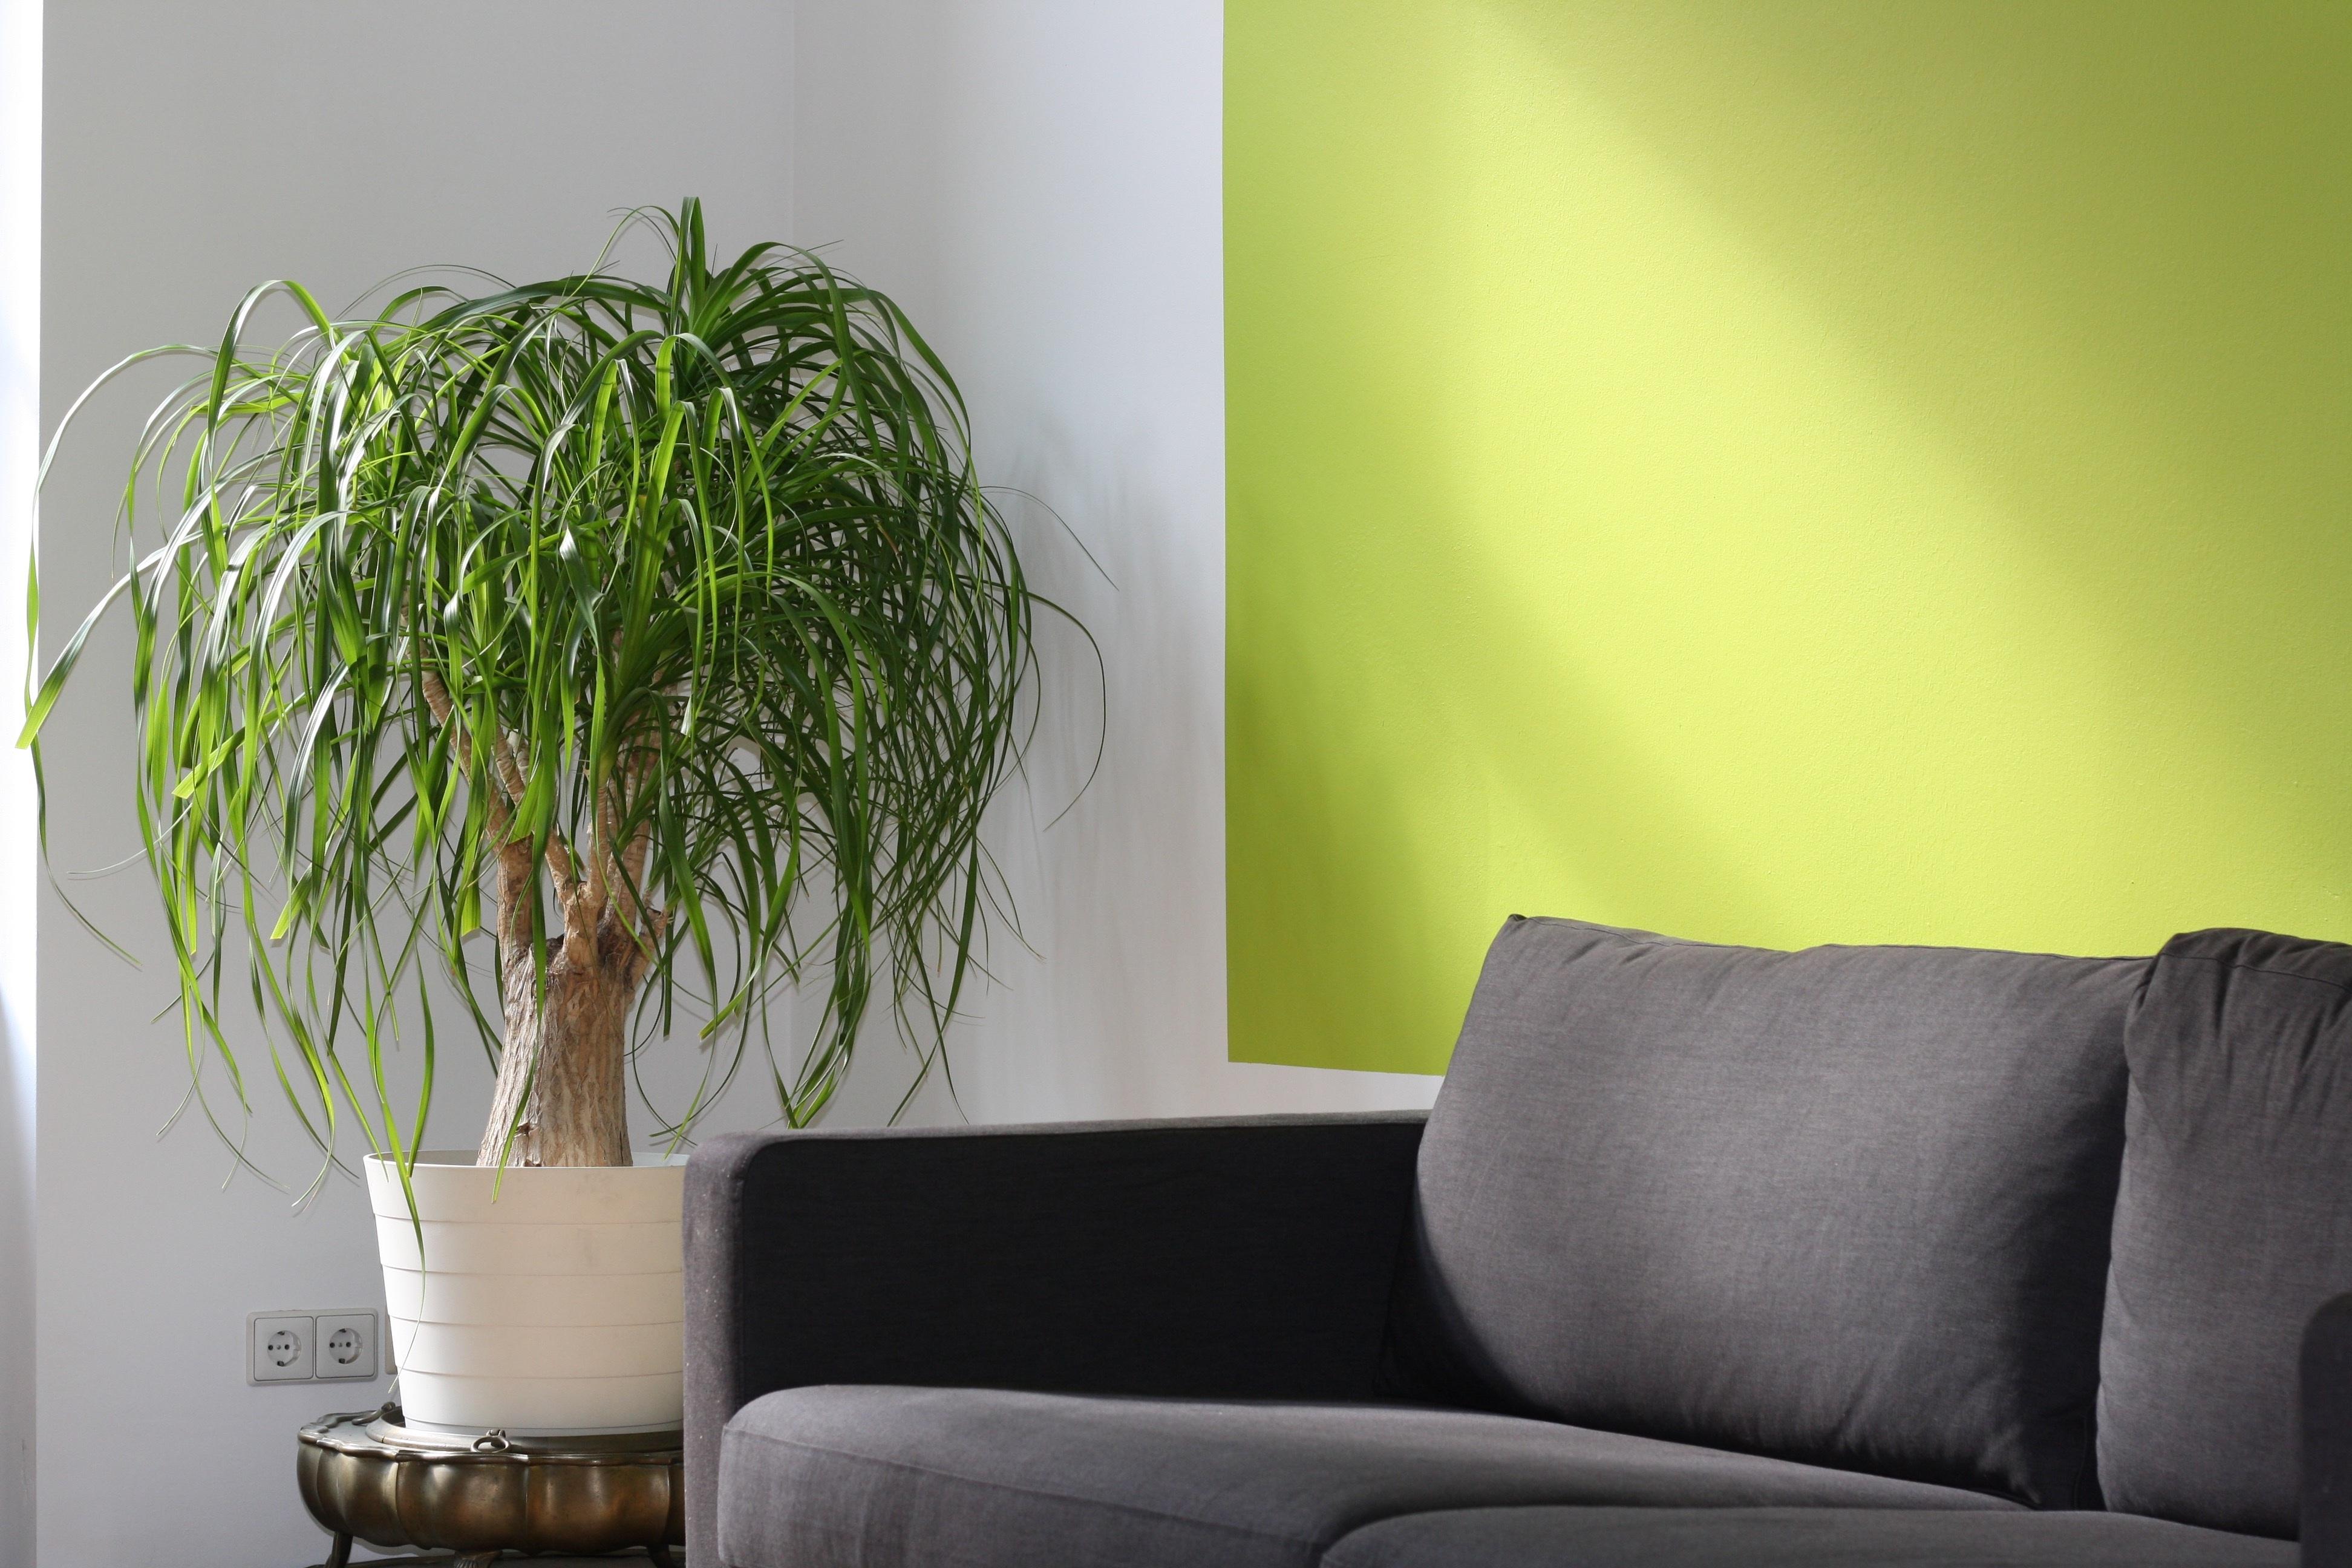 Free stock photo of apartment comfort contemporary for Combinacion de colores para paredes